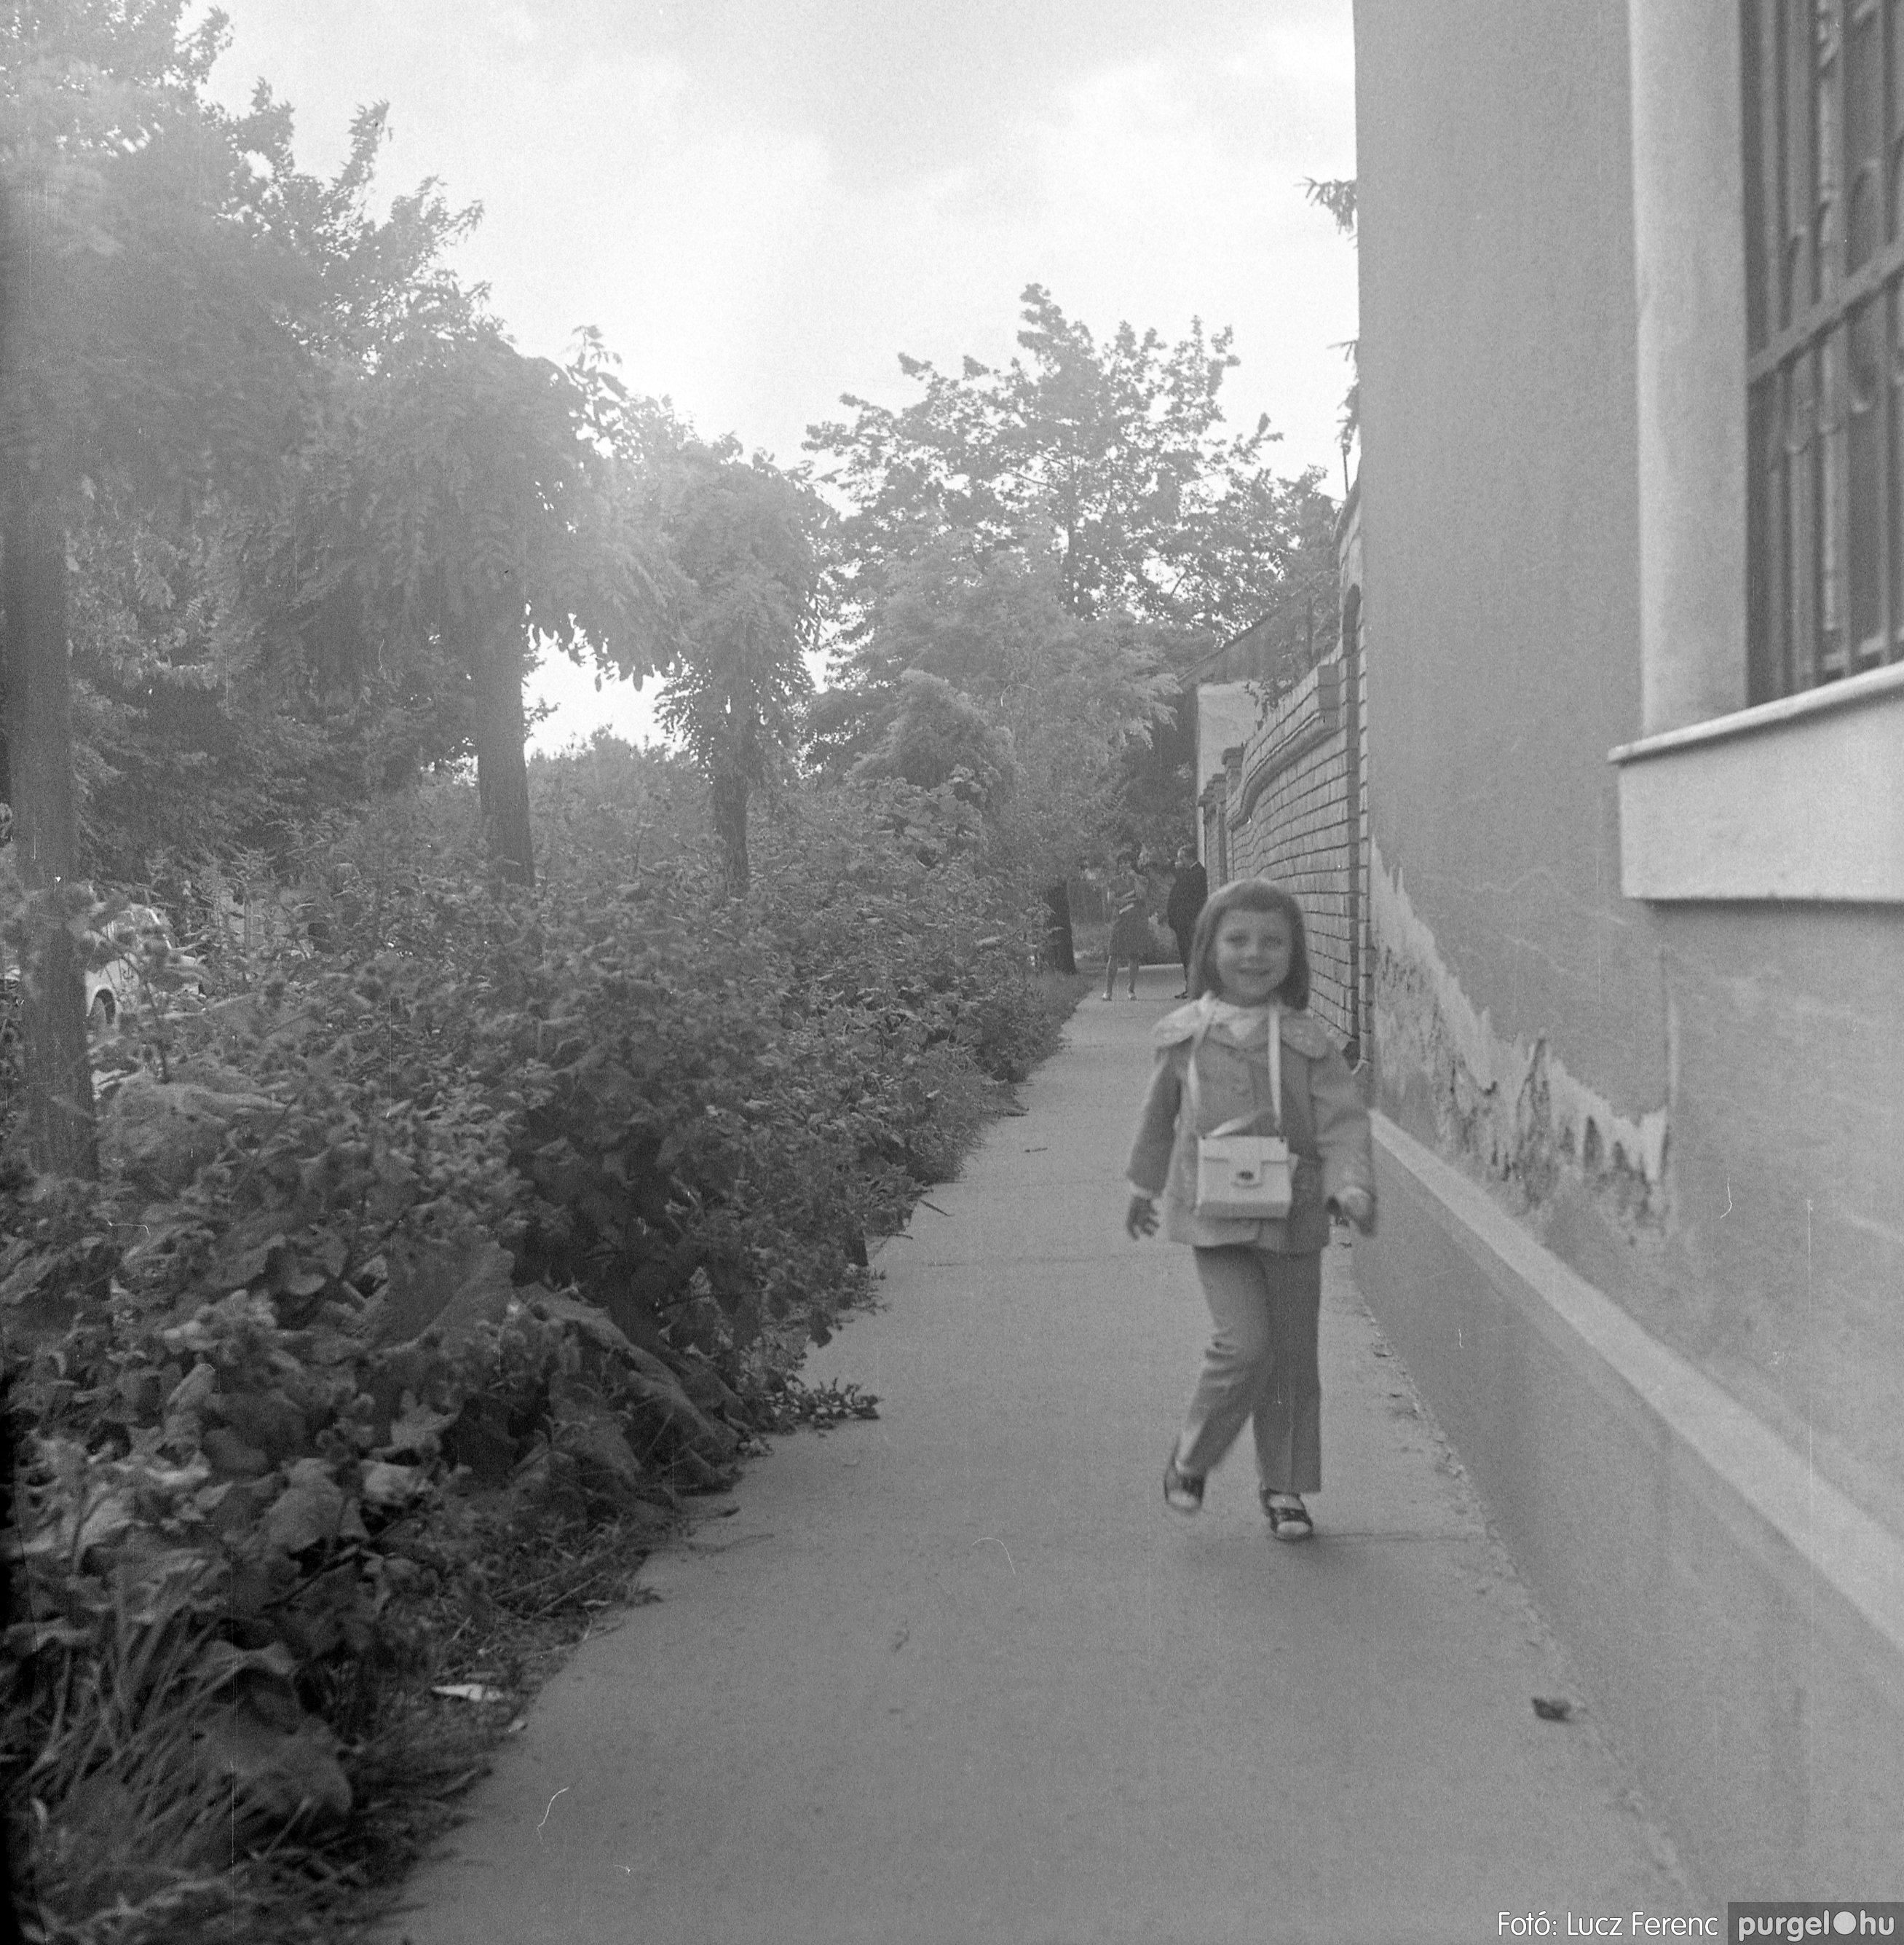 027. 1975. Buli a kultúrban 016. - Fotó: Lucz Ferenc.jpg